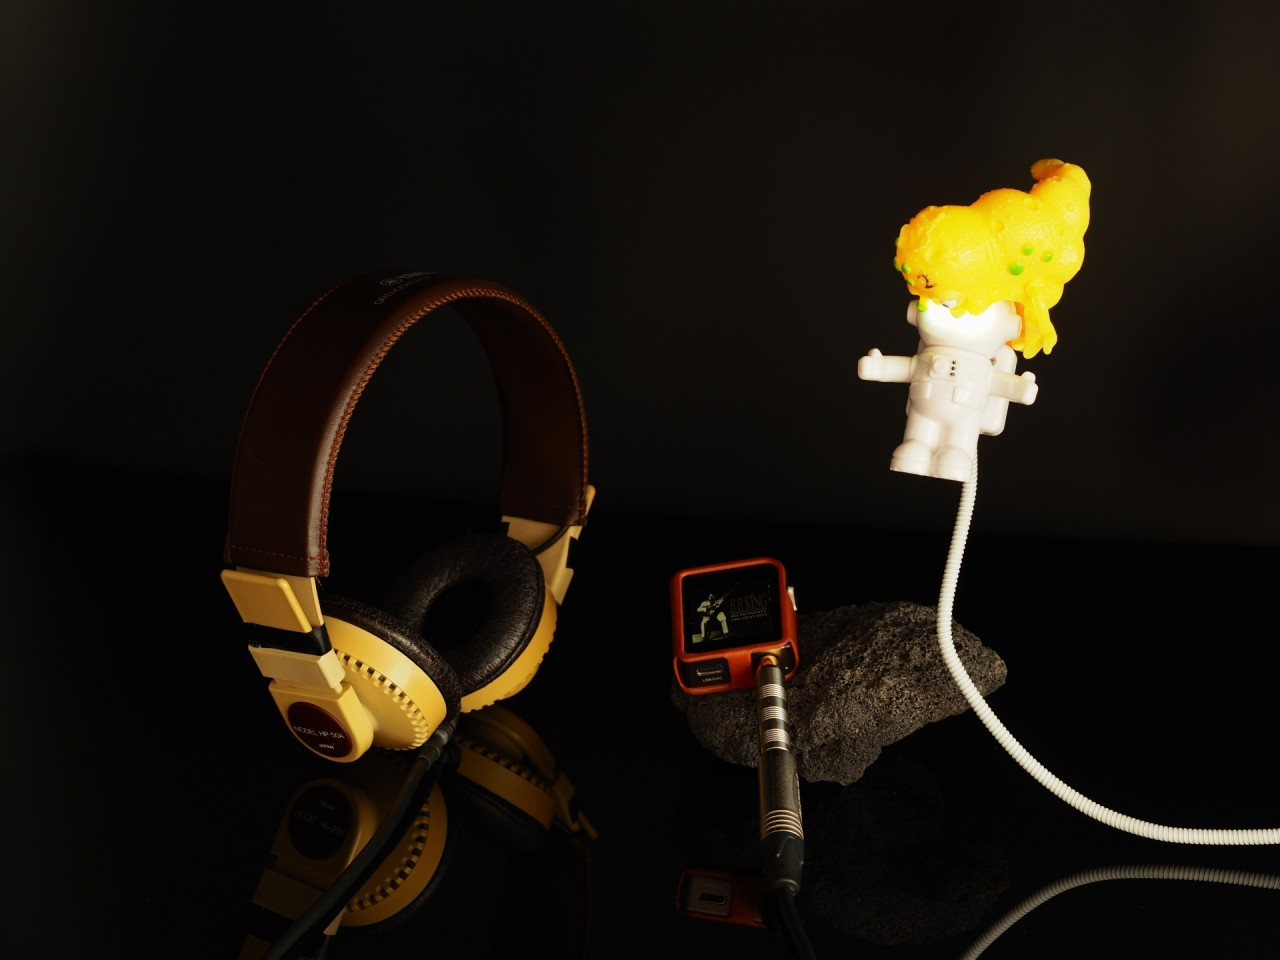 Modded by Ludoo (rewired for stereo, neutrik plug, british felt)